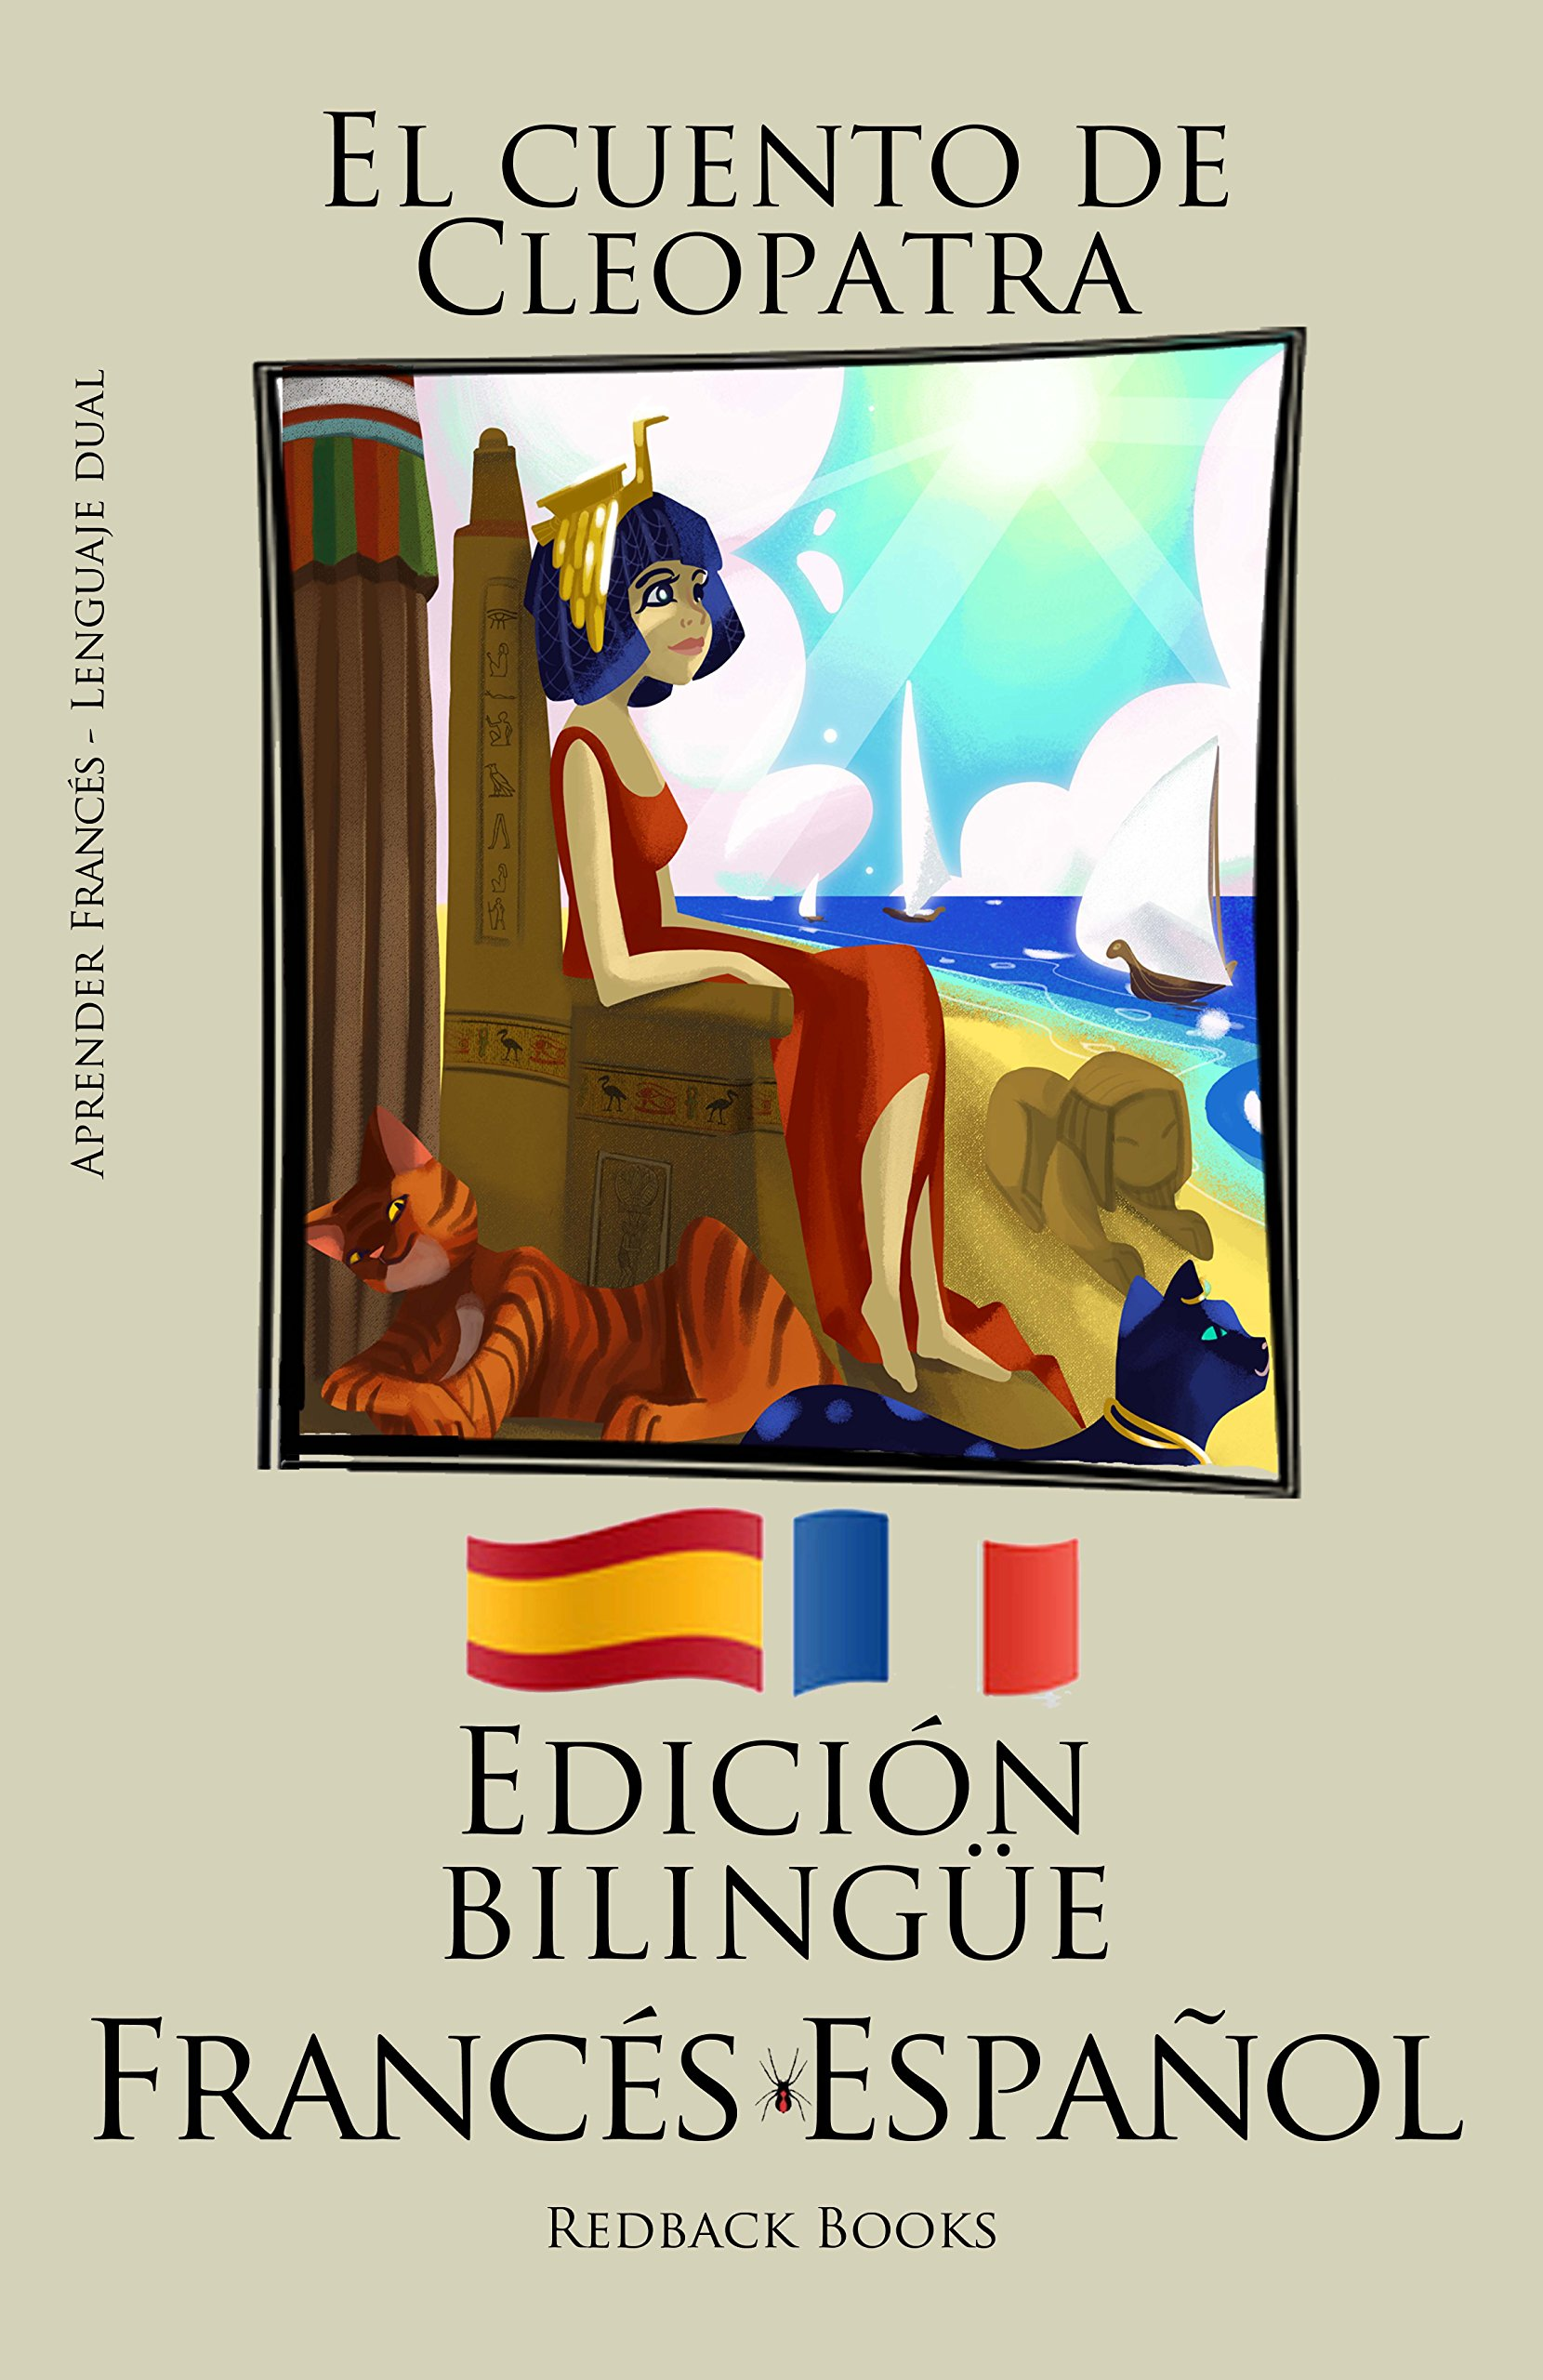 Aprender francés - Edición bilingüe (Francés - Español) El cuento de Cleopatra